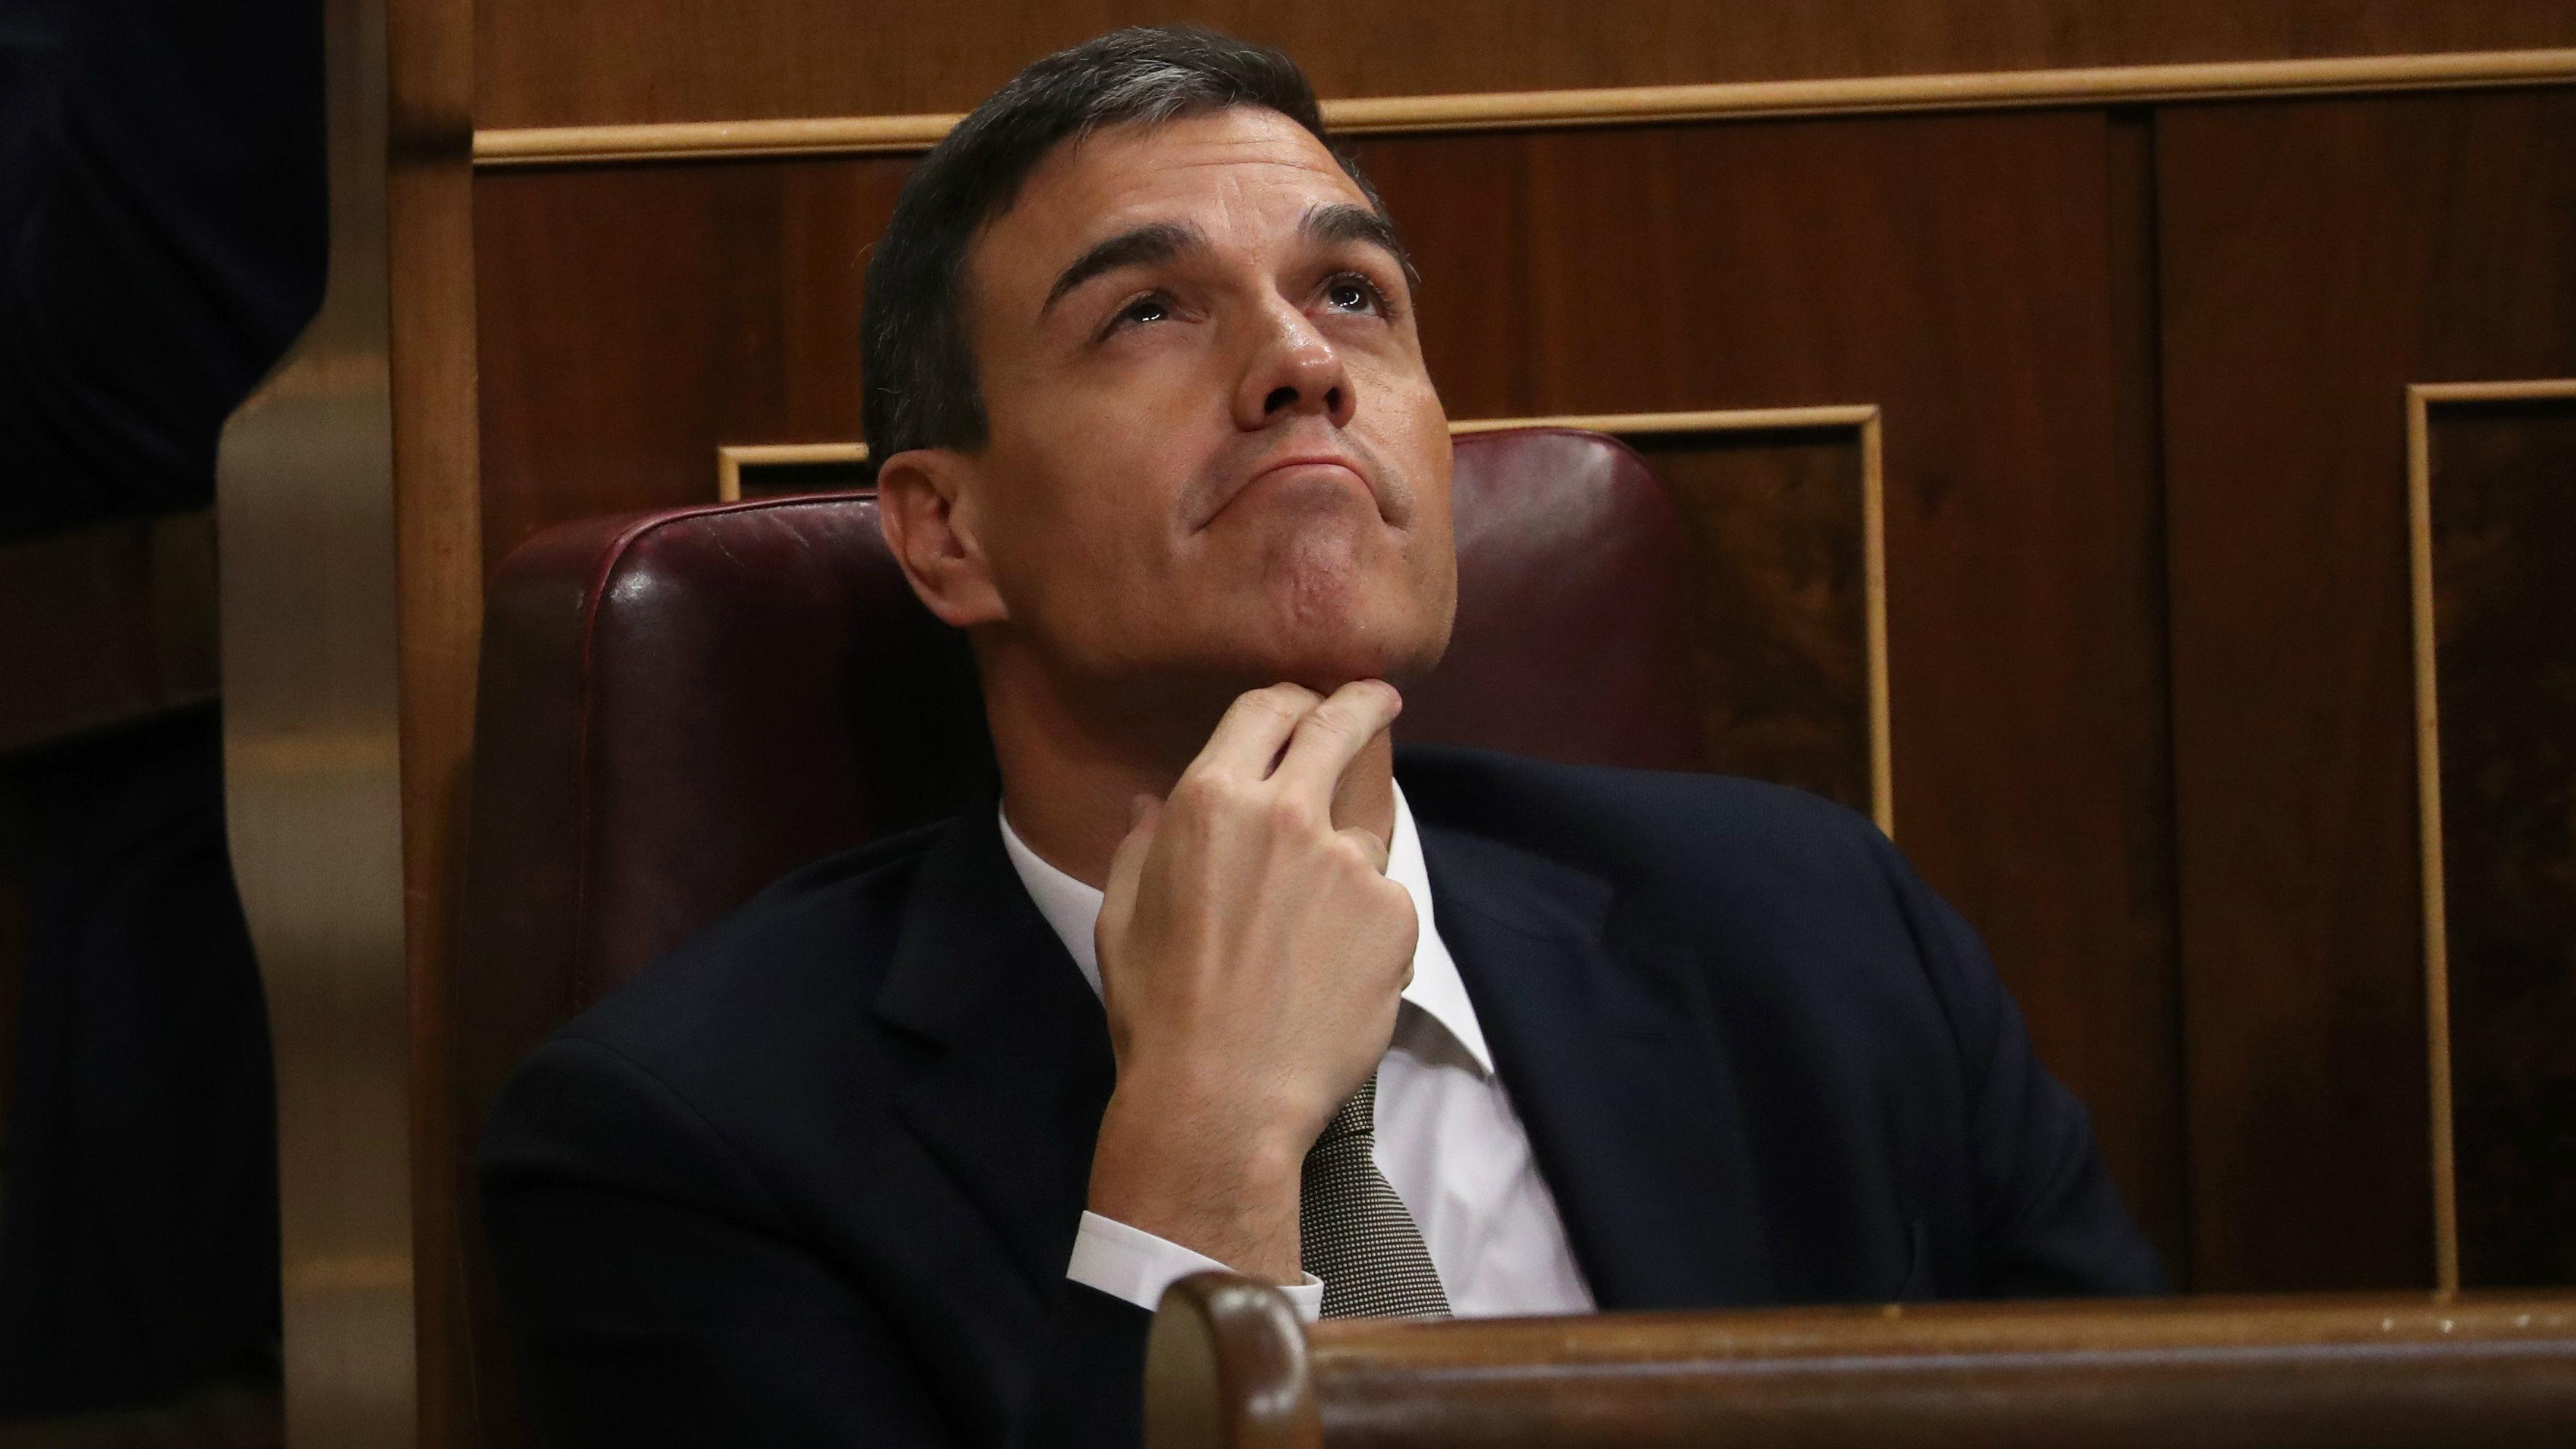 Spain's new prime minister pedro sanchez mr handsome